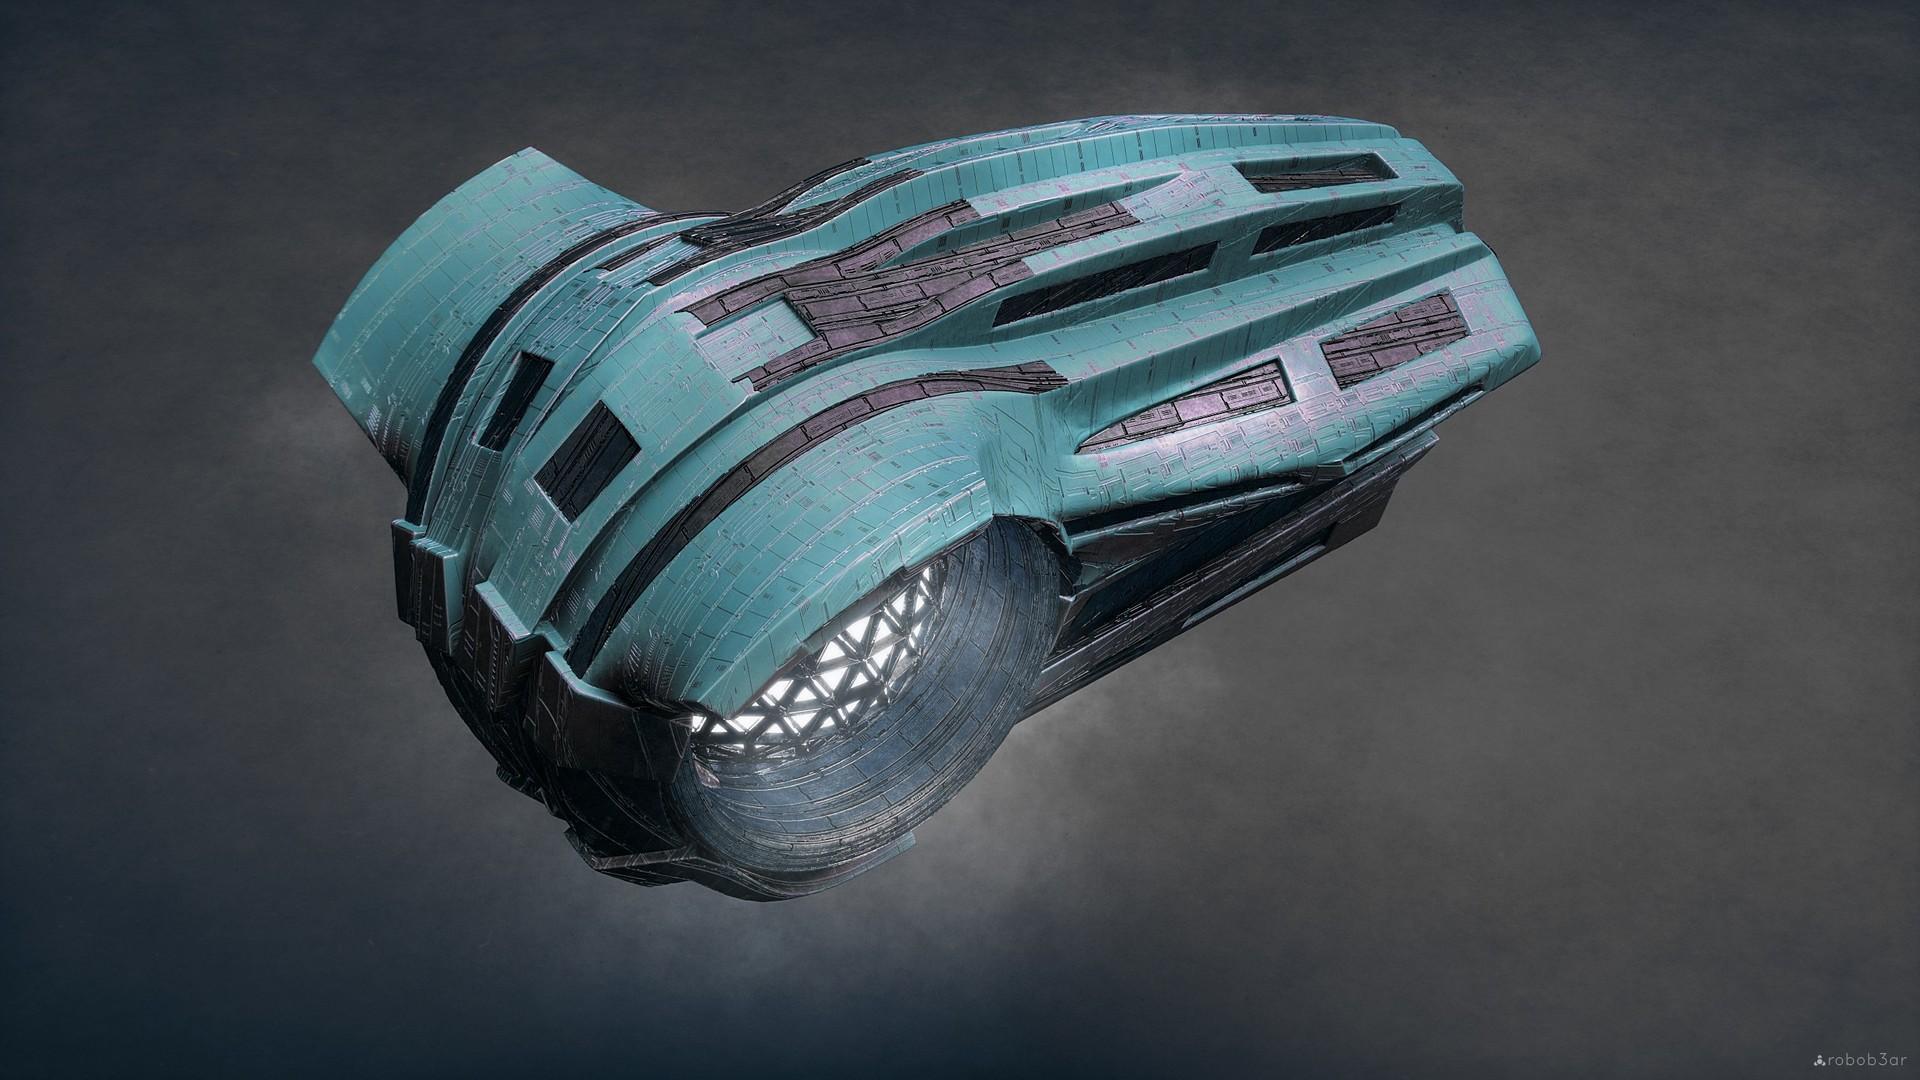 Kresimir jelusic robob3ar 463 190117 ship cyan ps custom